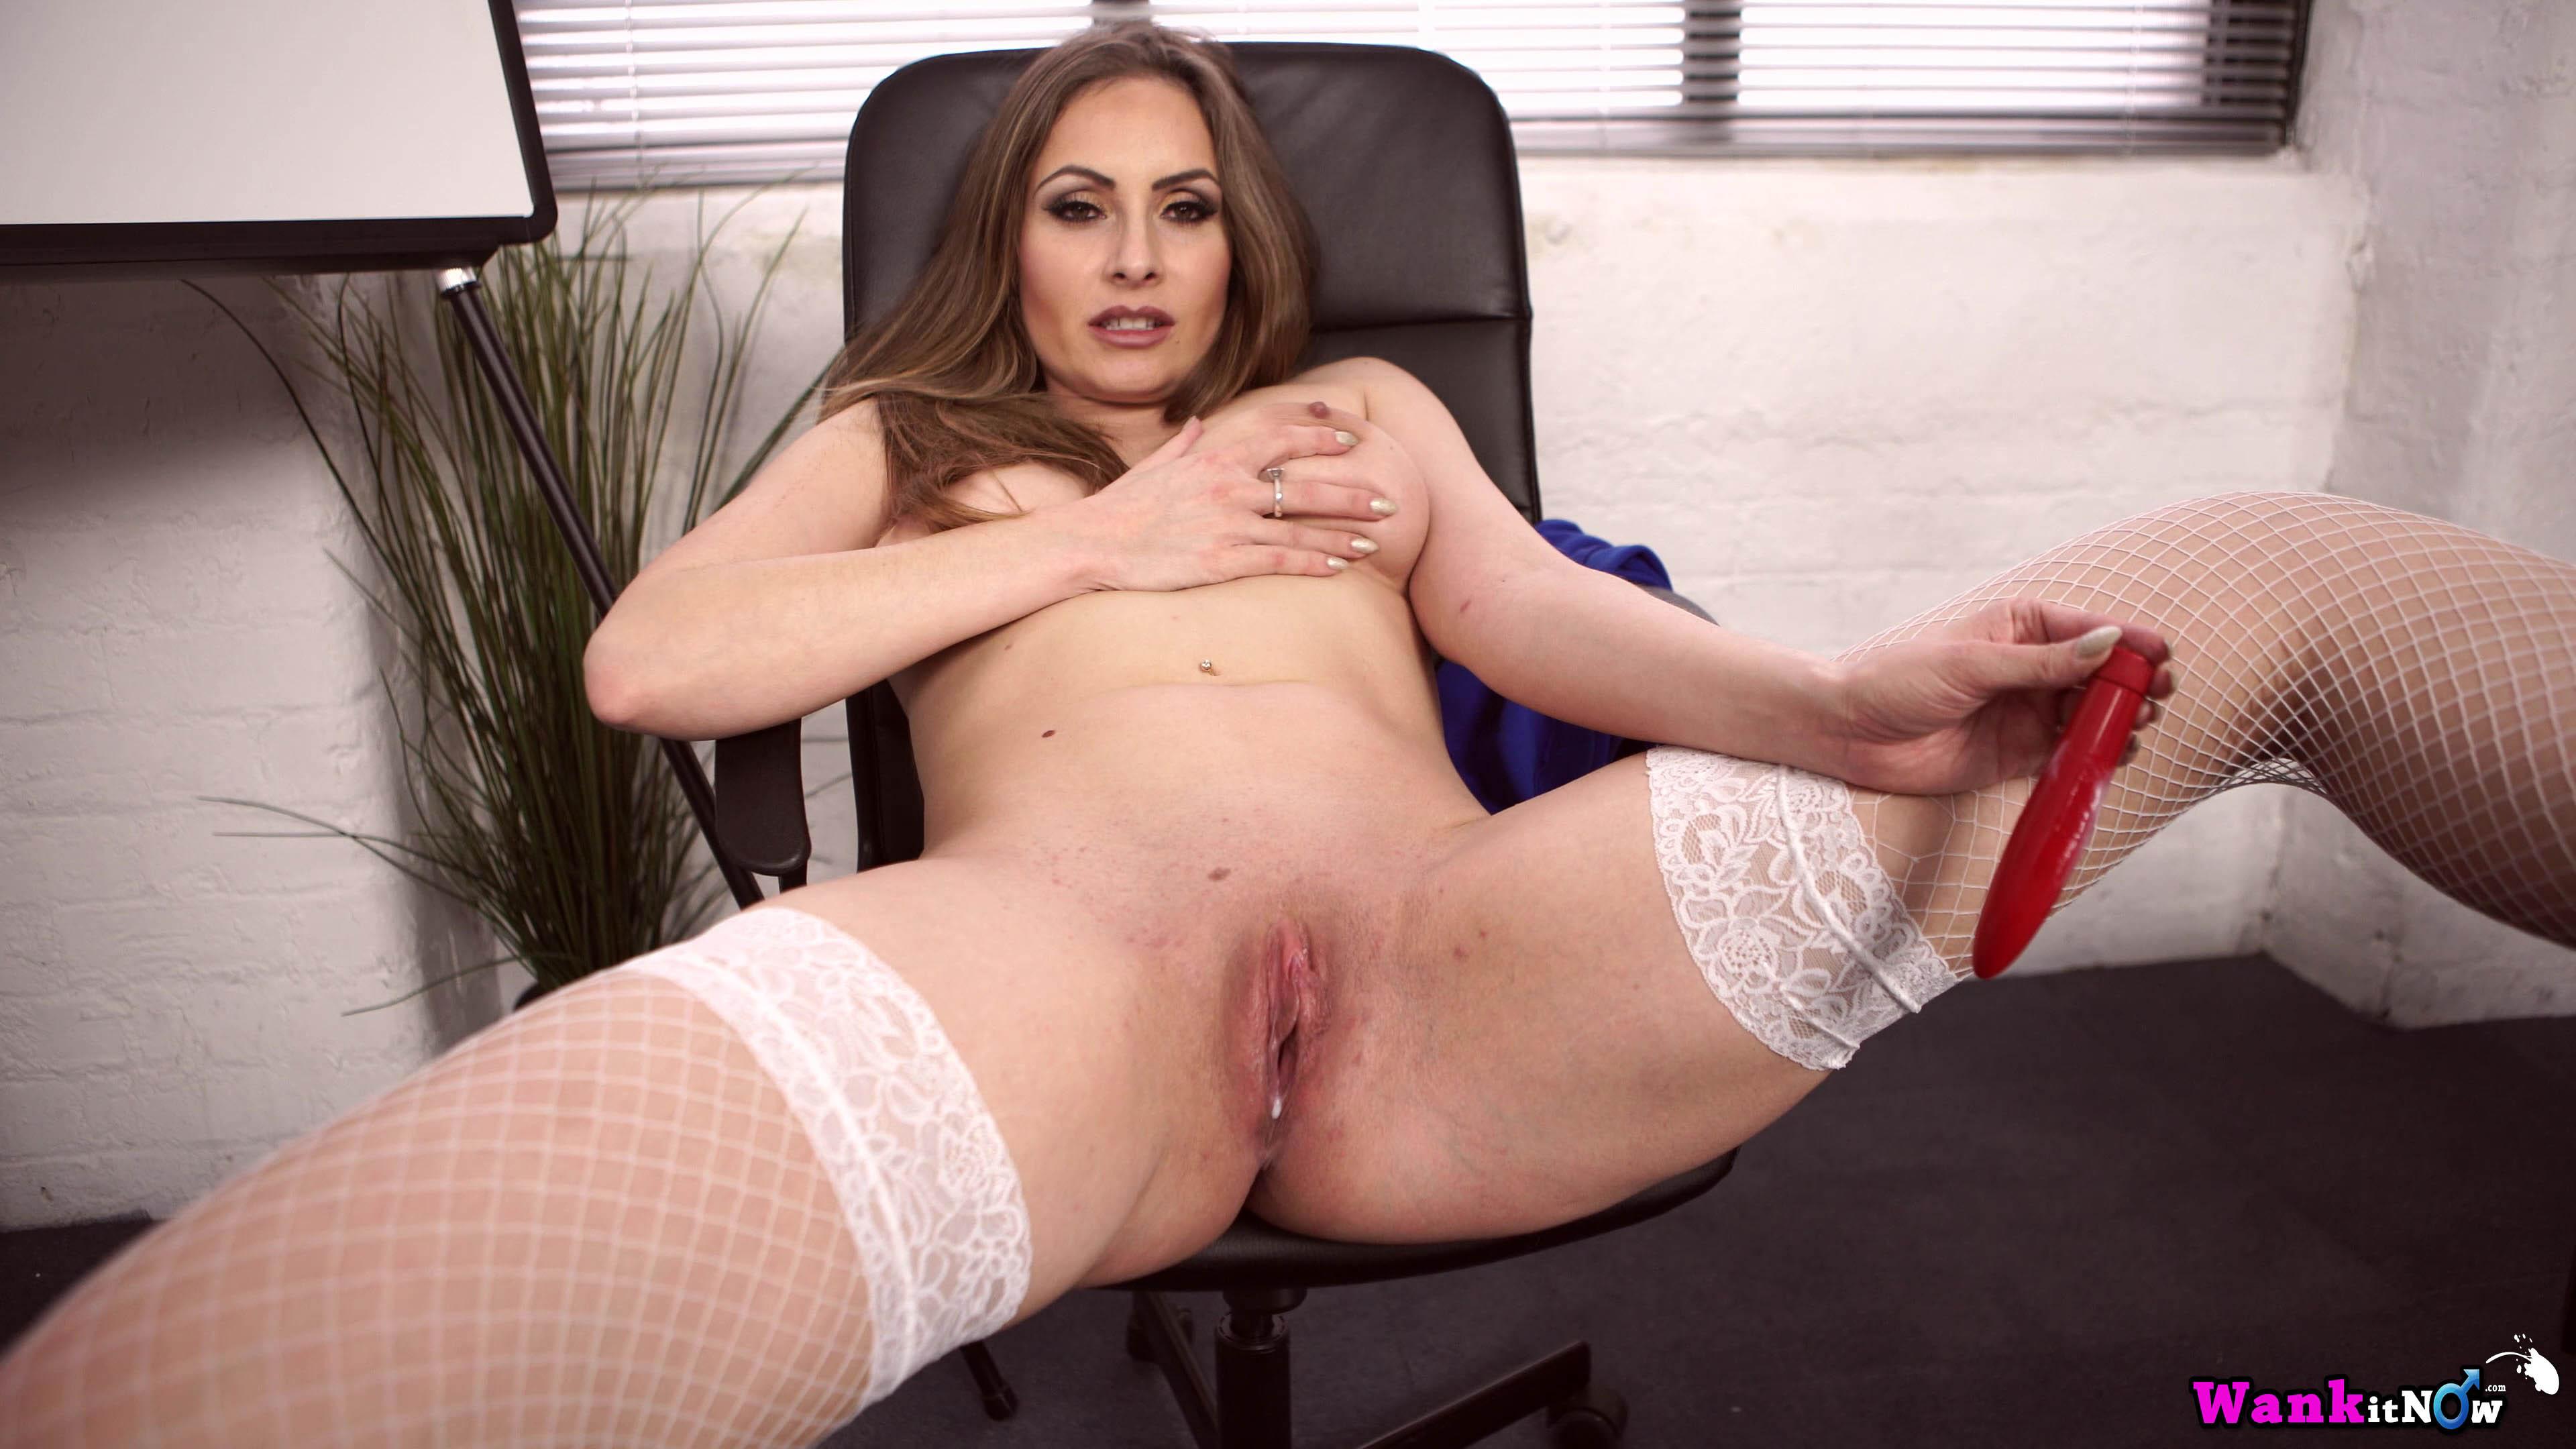 Asian hermaphrodite sex